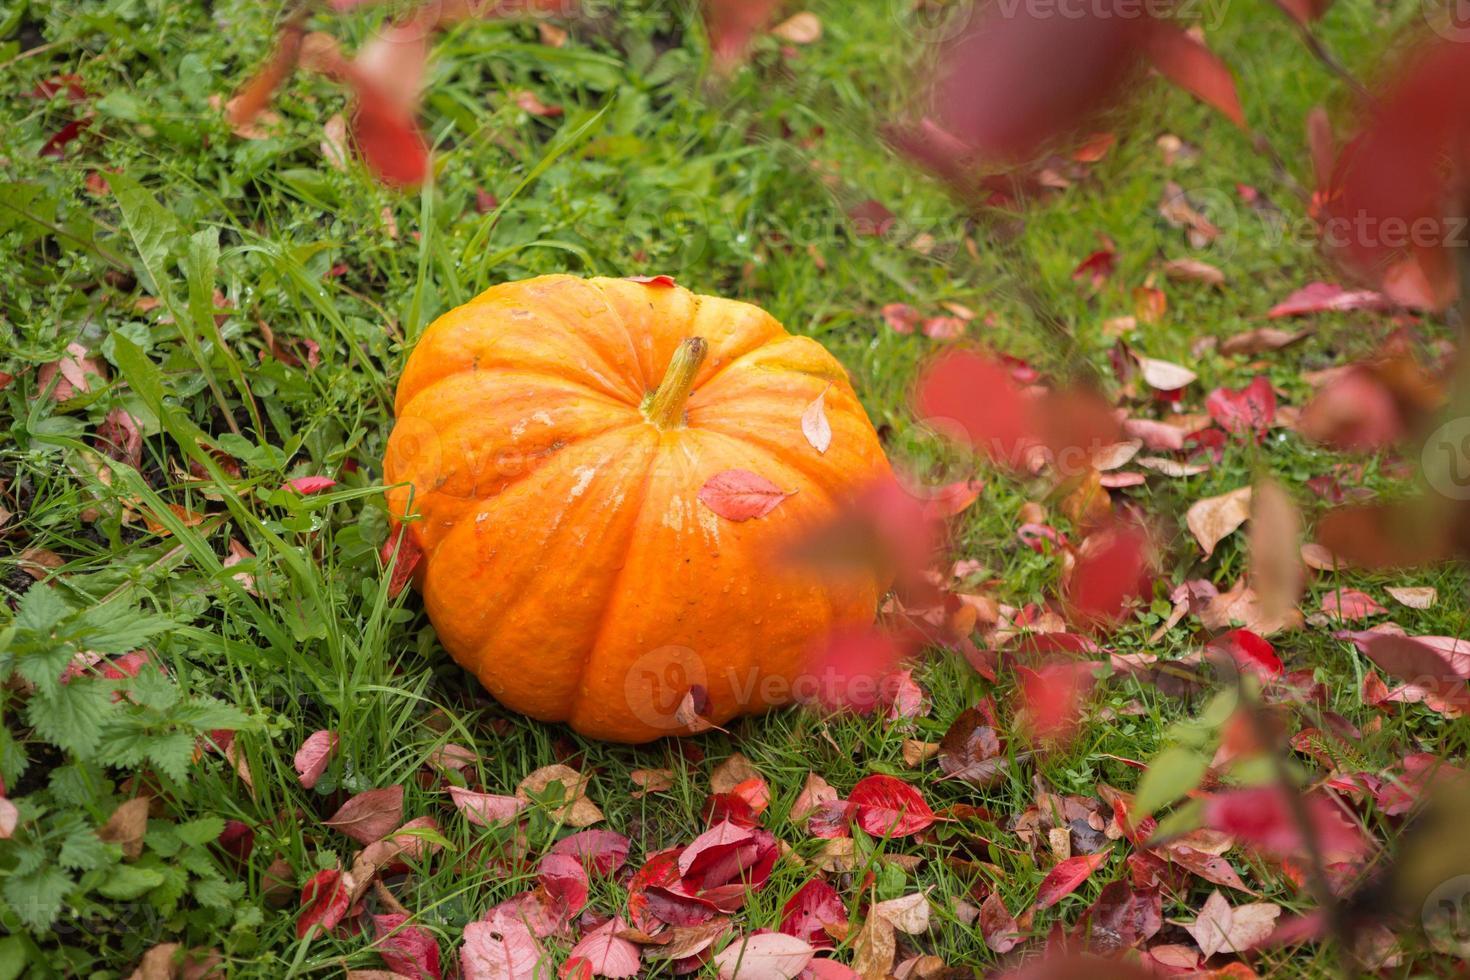 Big pumpkin in the garden photo